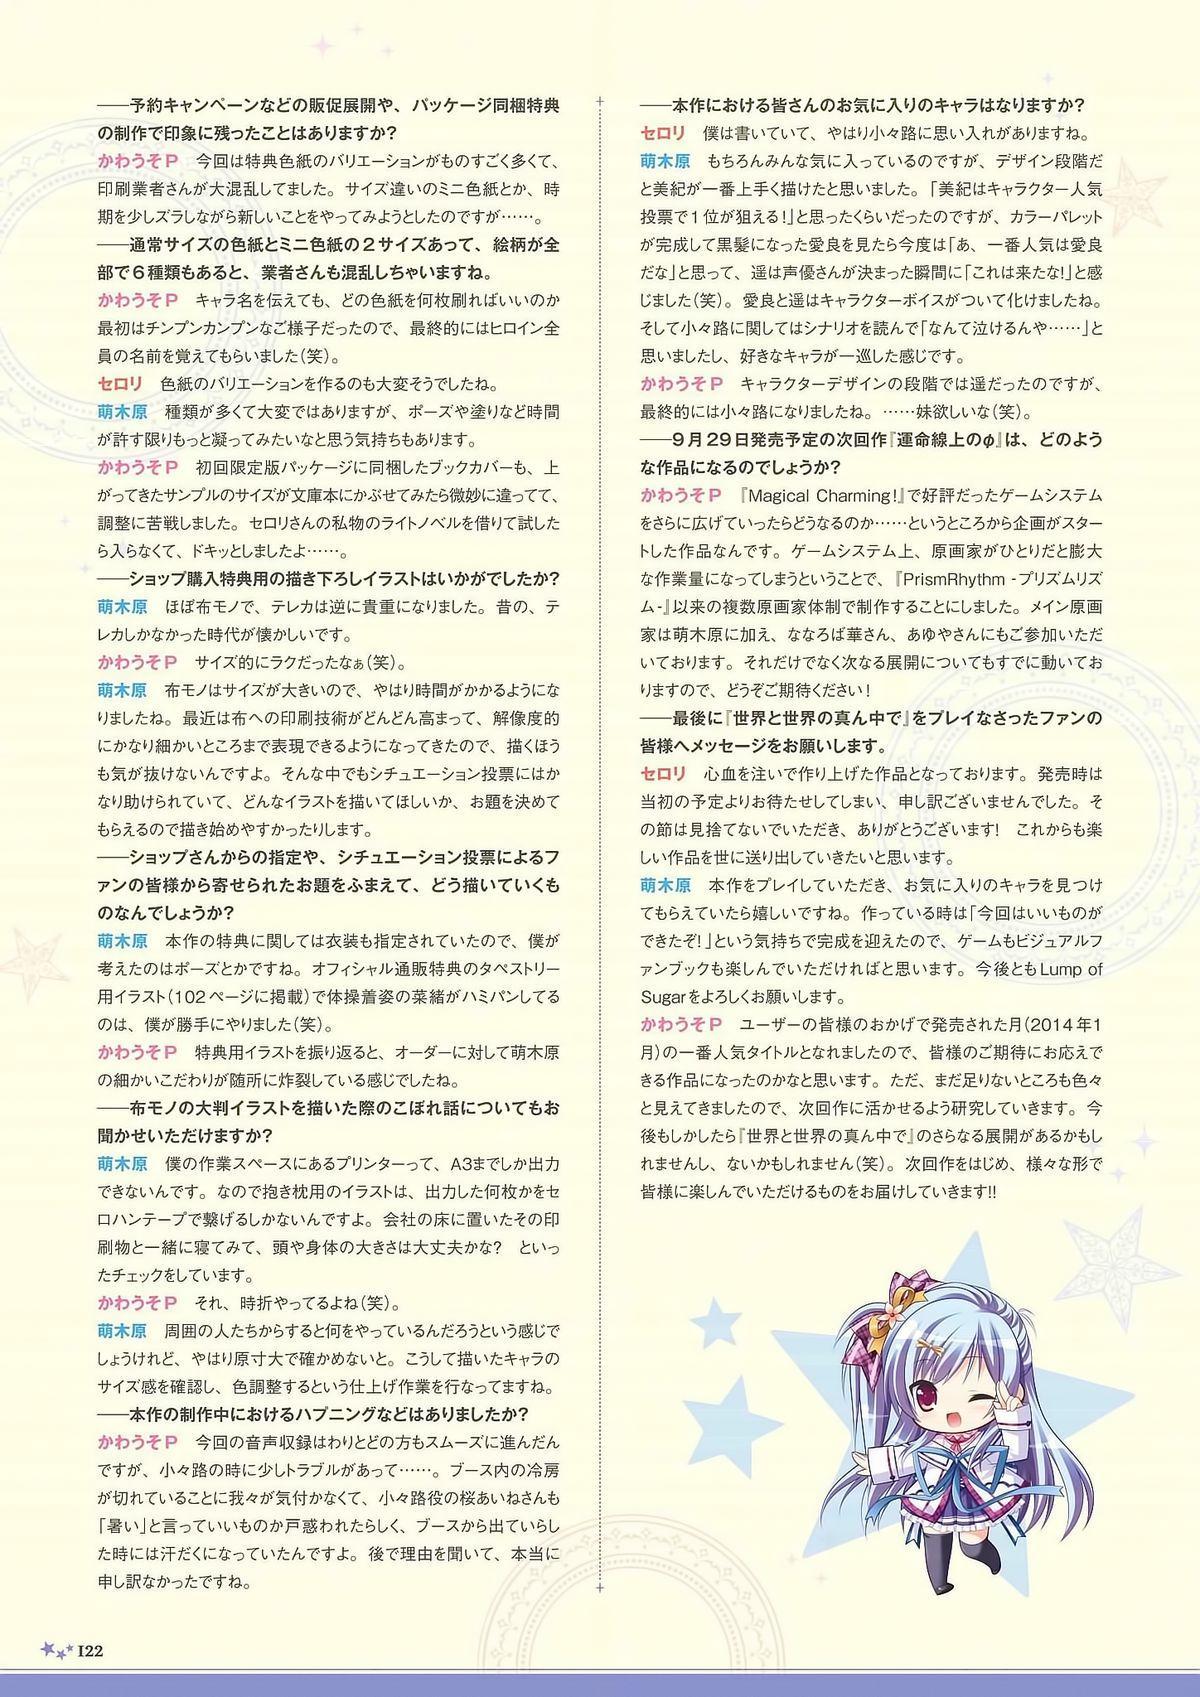 Sekai to Sekai no Mannaka de Visual Fanbook 119